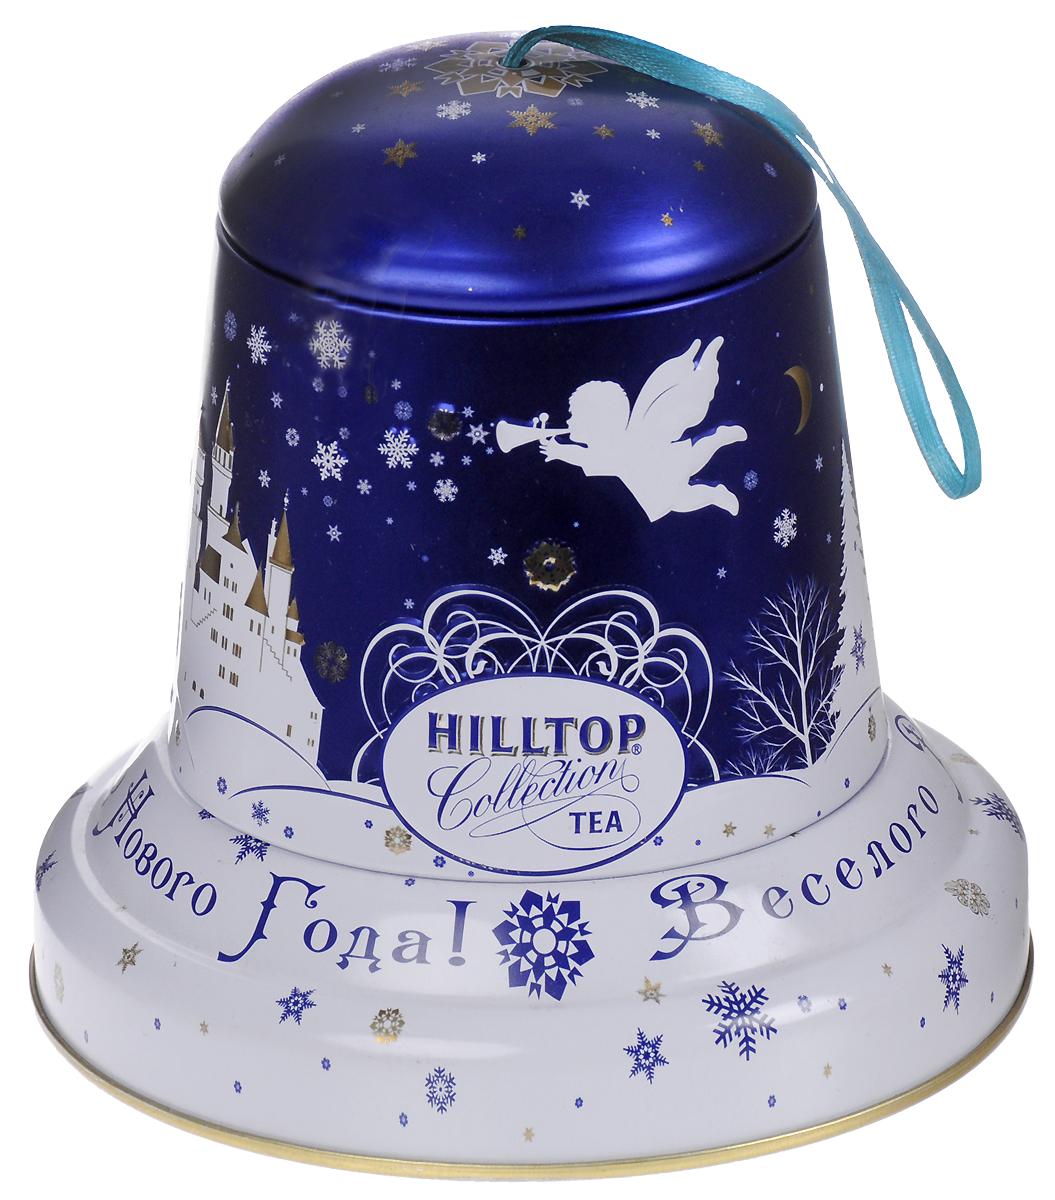 Hilltop Снежный ангел чай черный листовой, 100 г4607099304468_НГ